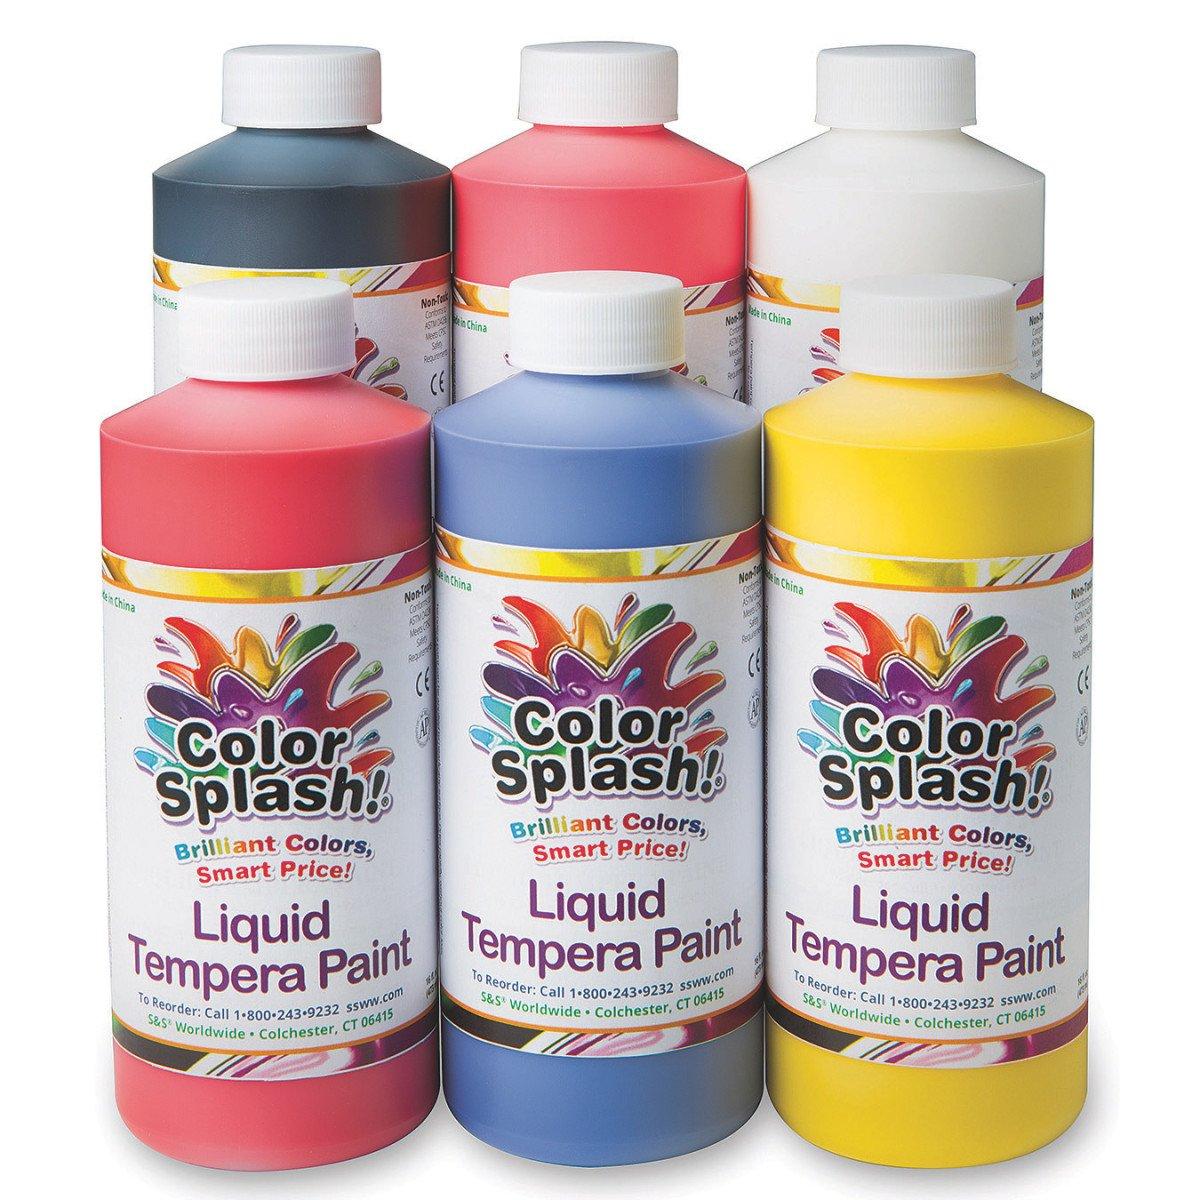 Color Splash! Liquid Tempera Paint Assortment, 16-oz. (Pack of 6)